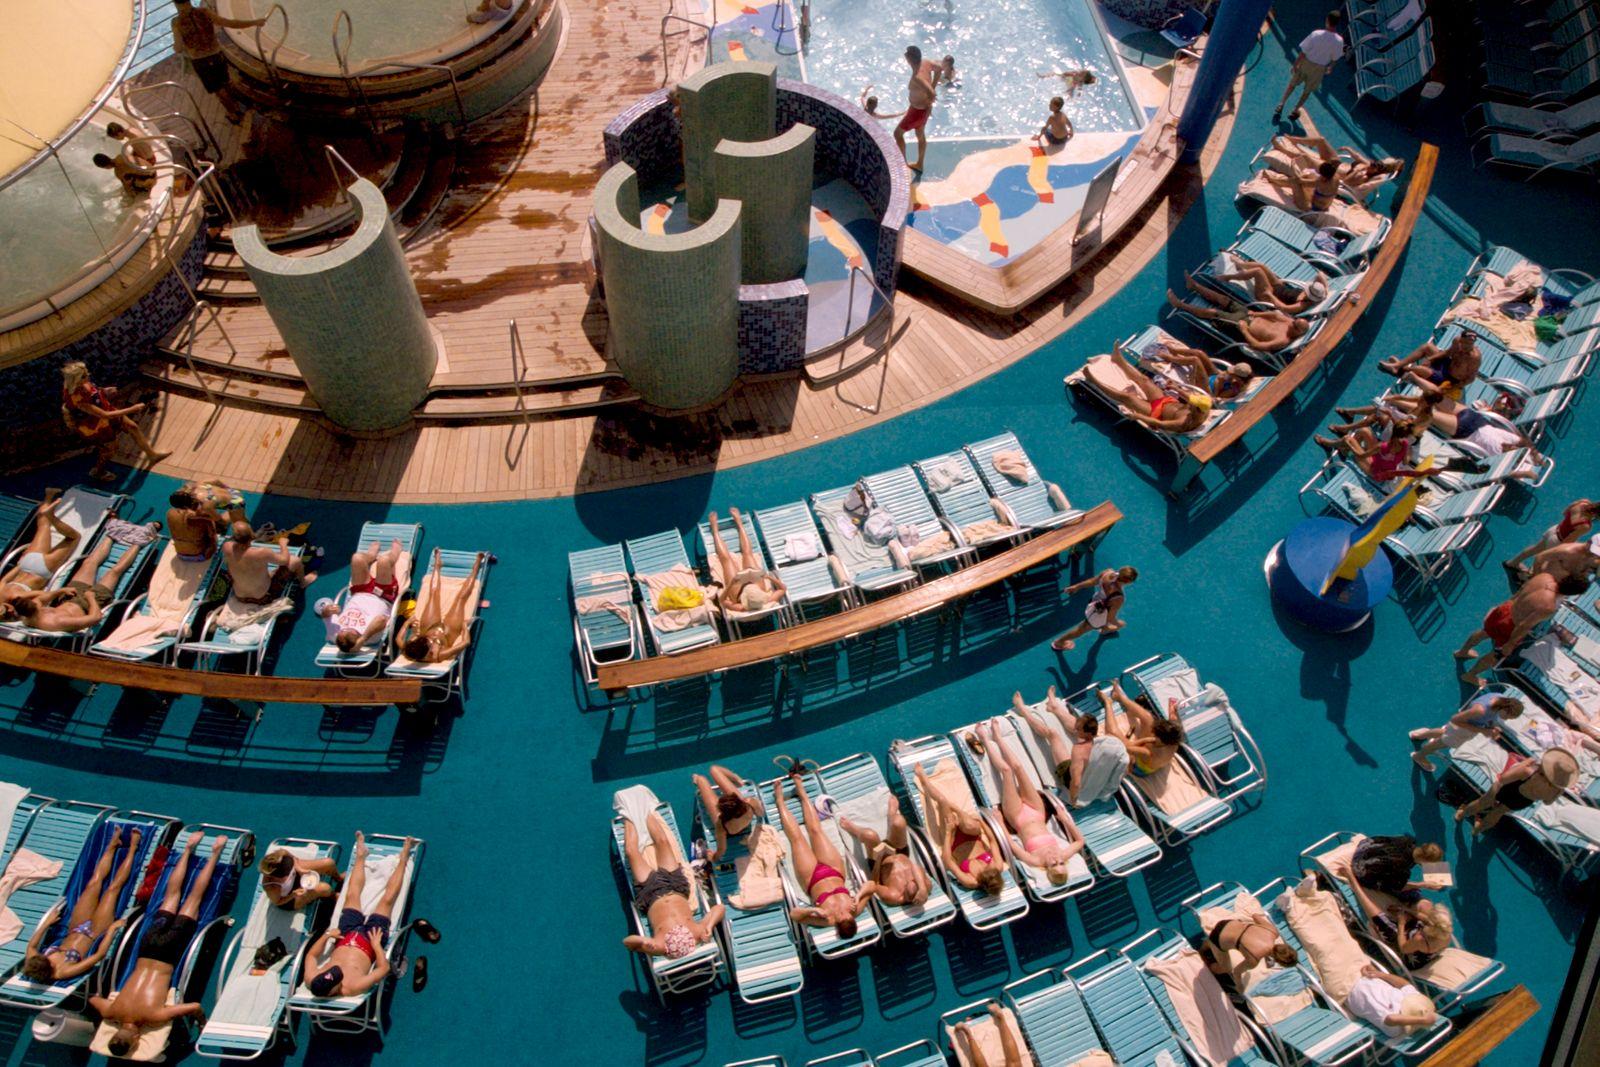 Sunbathers on Cruise Ship Deck